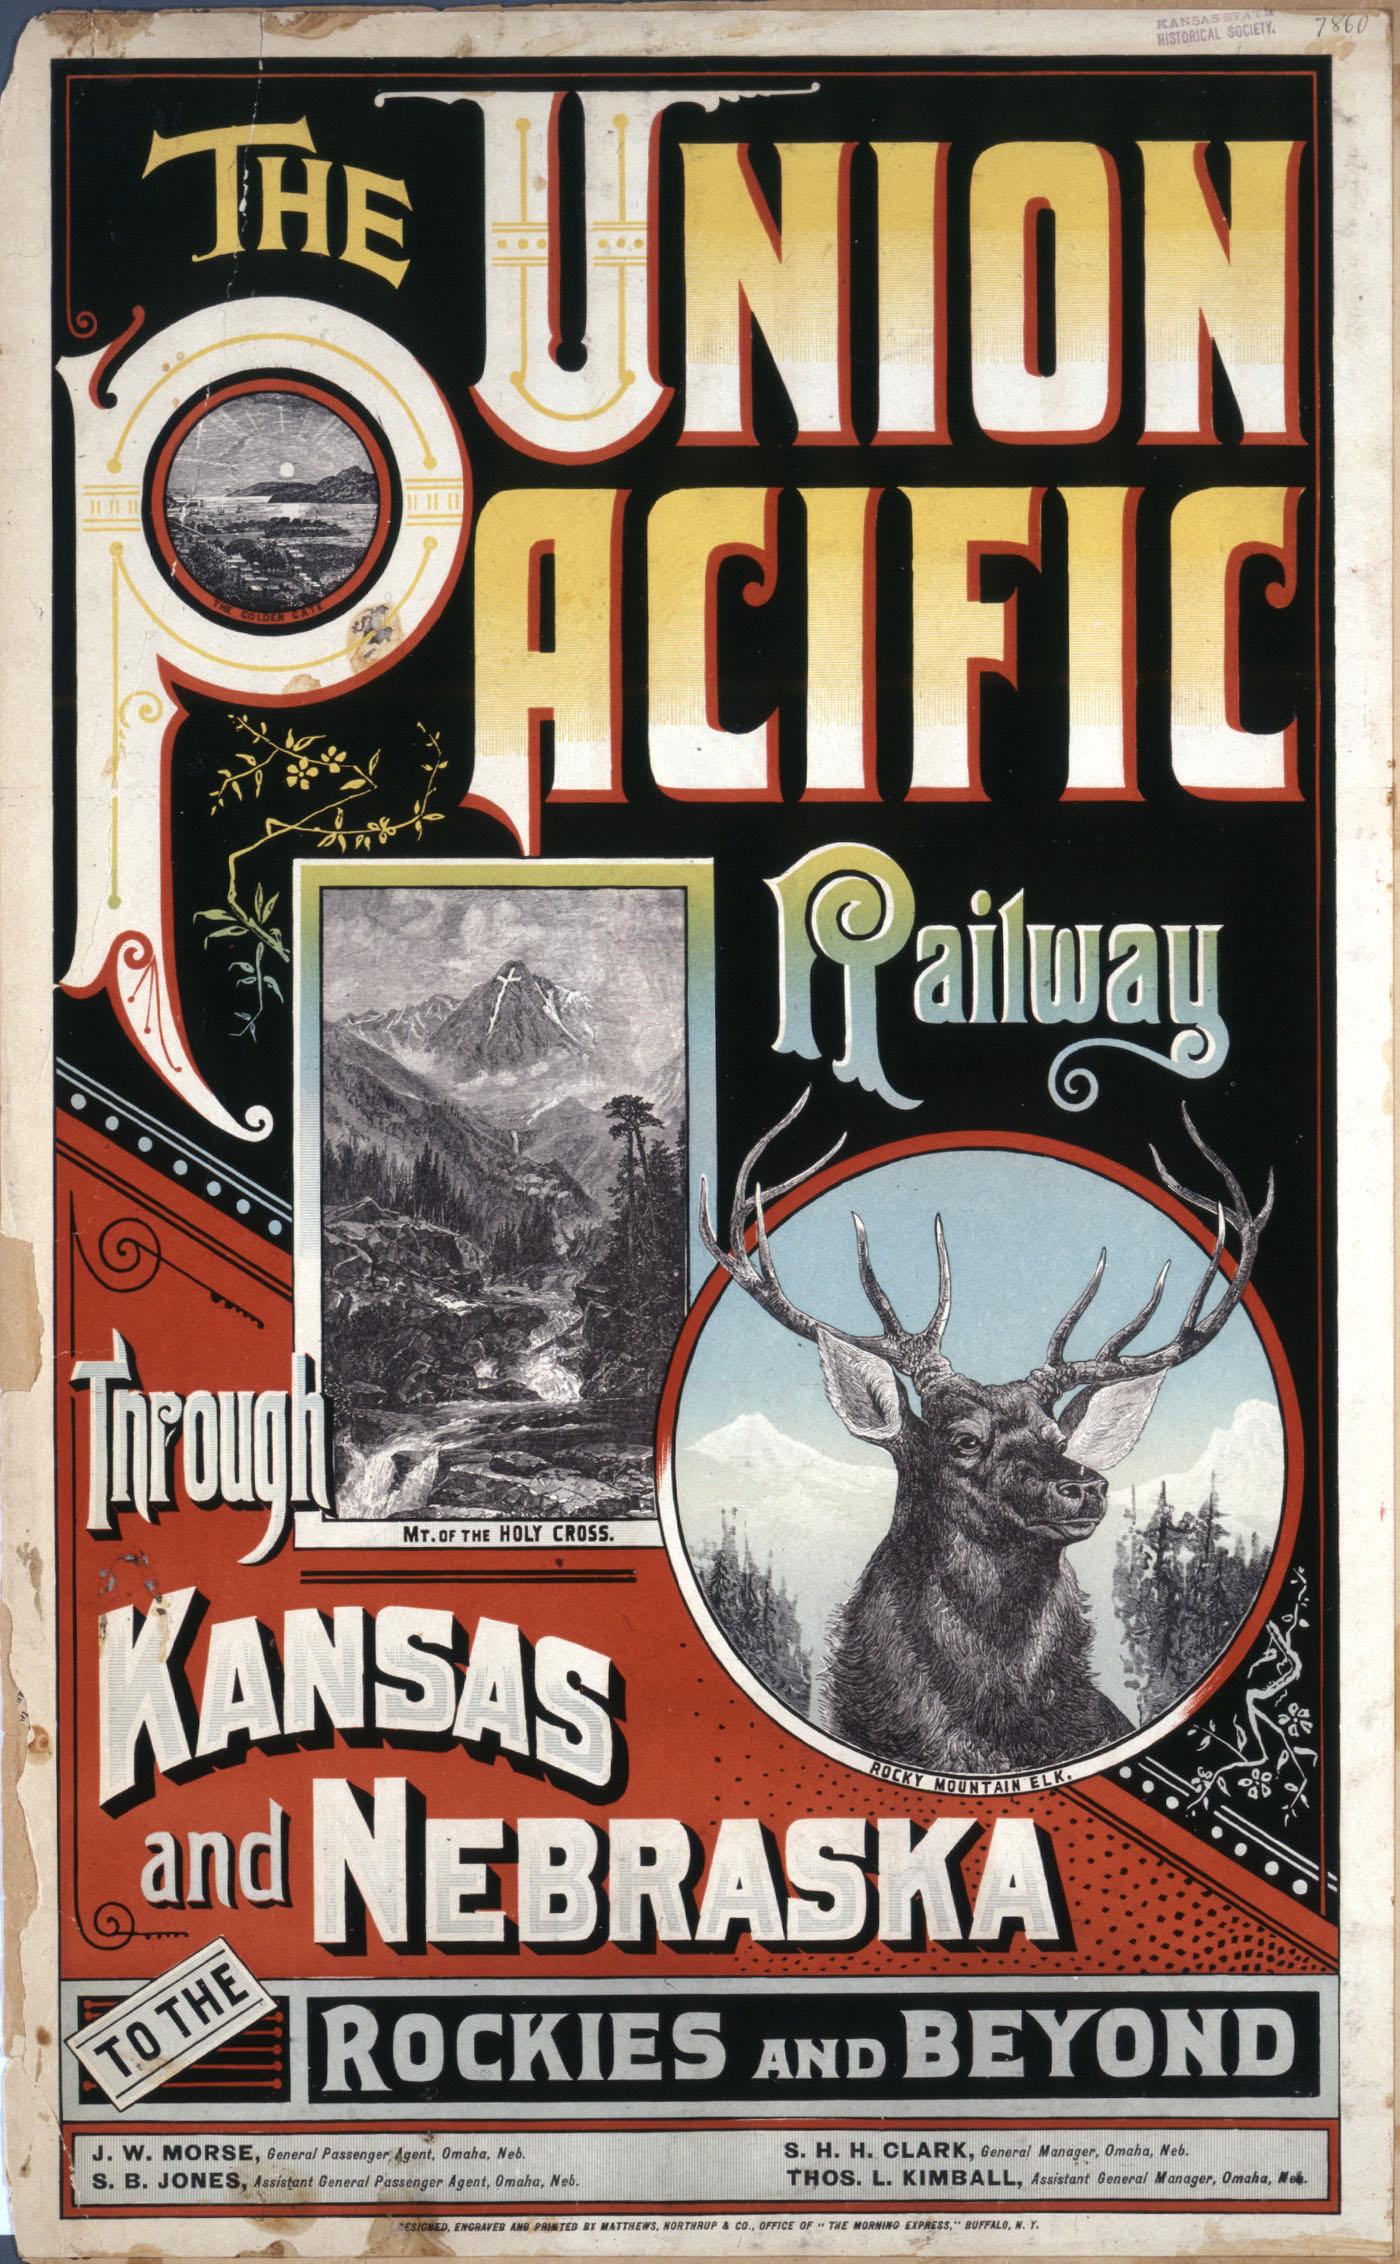 The Union Pacific Railway through Kansas and Nebraska to the Rockies and beyond